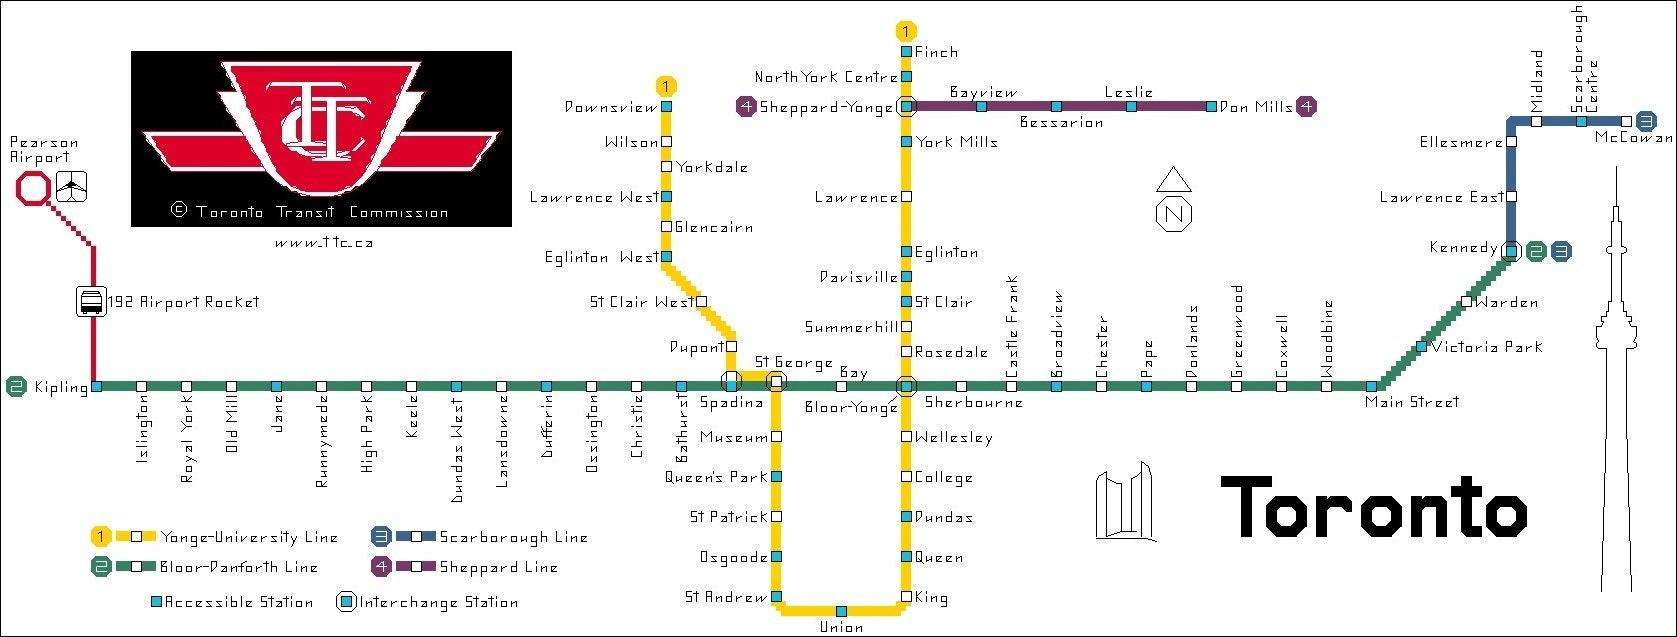 Toronto Subway Map Pdf.Toronto Subway Map Cross Stitch Pattern Pdf Download Metro Design Chart Ontario Canada